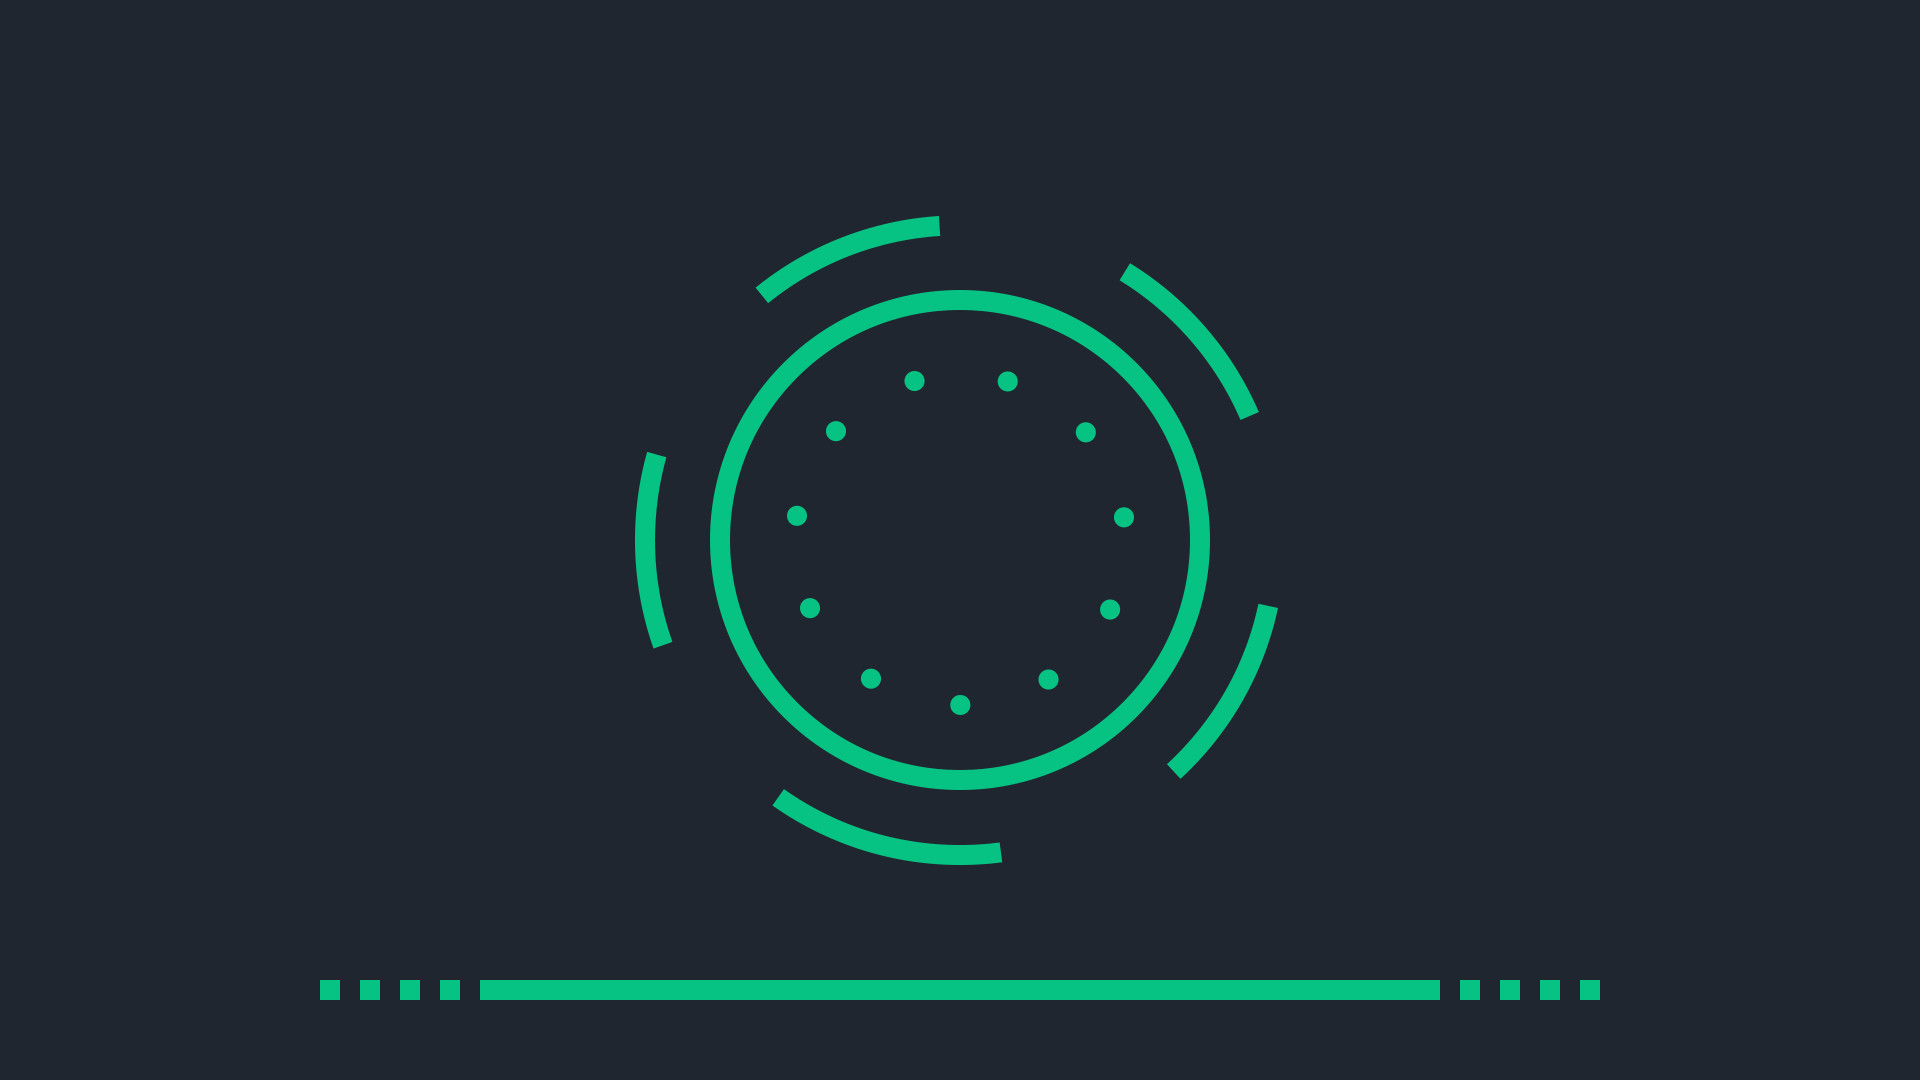 Simple Circle Minimalism